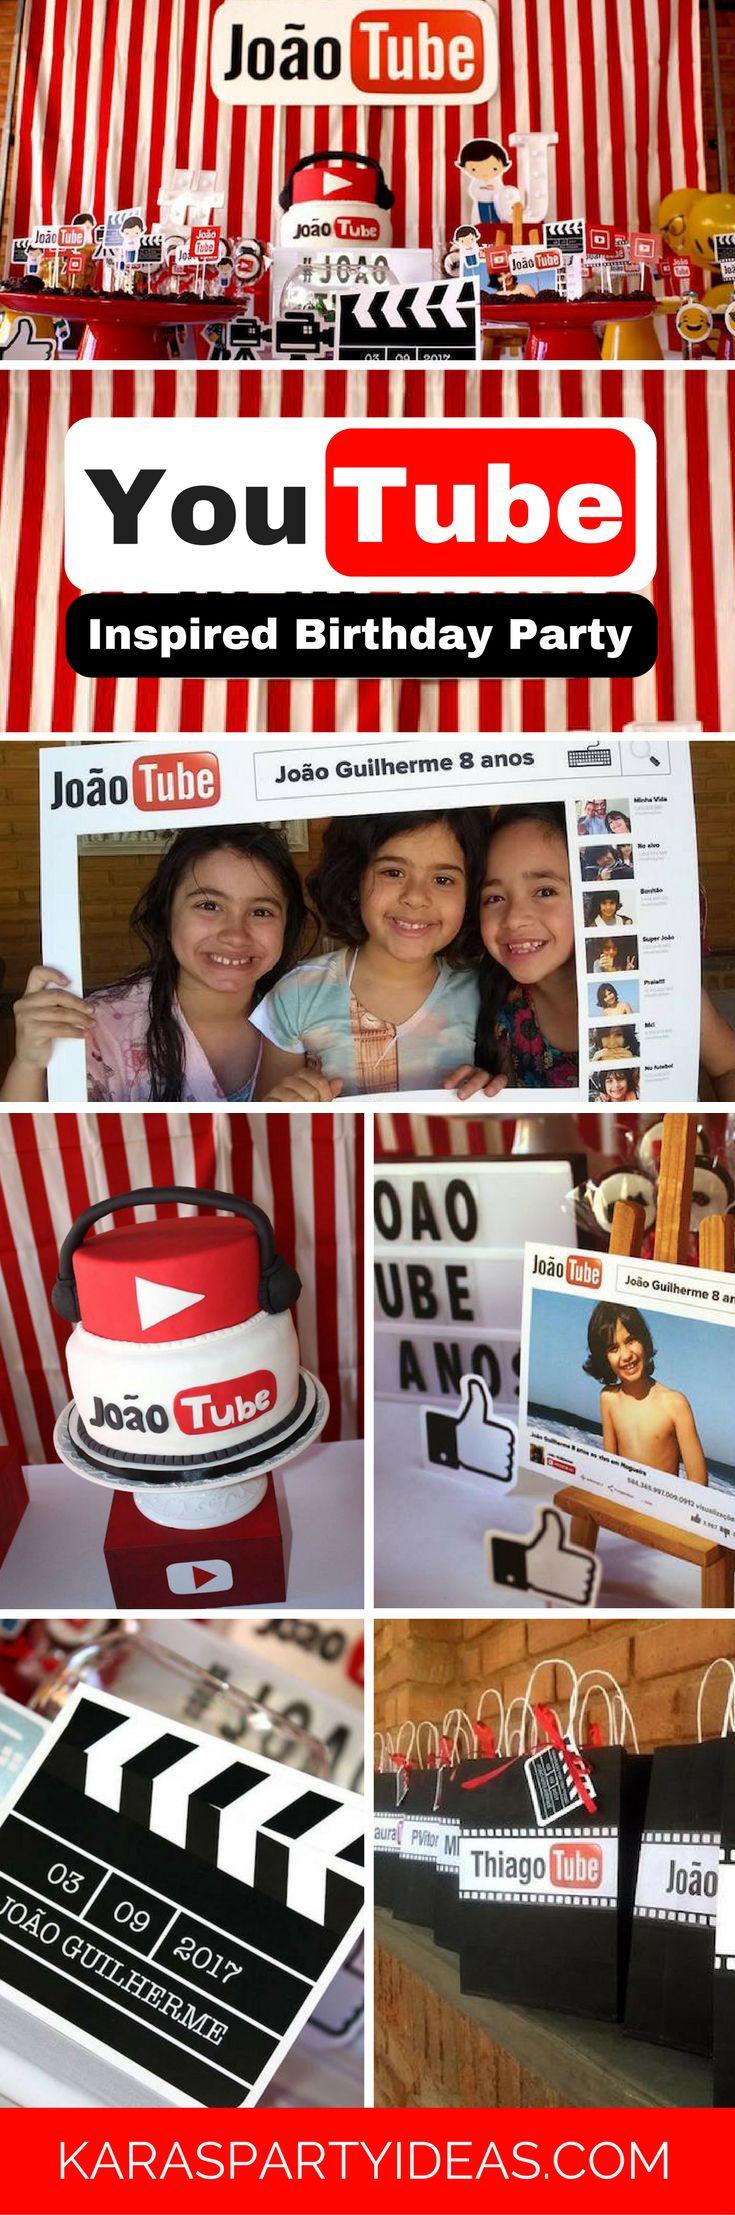 Youtube Themed Birthday Party Birthday Party For Teens Boy Birthday Parties Fun Birthday Party